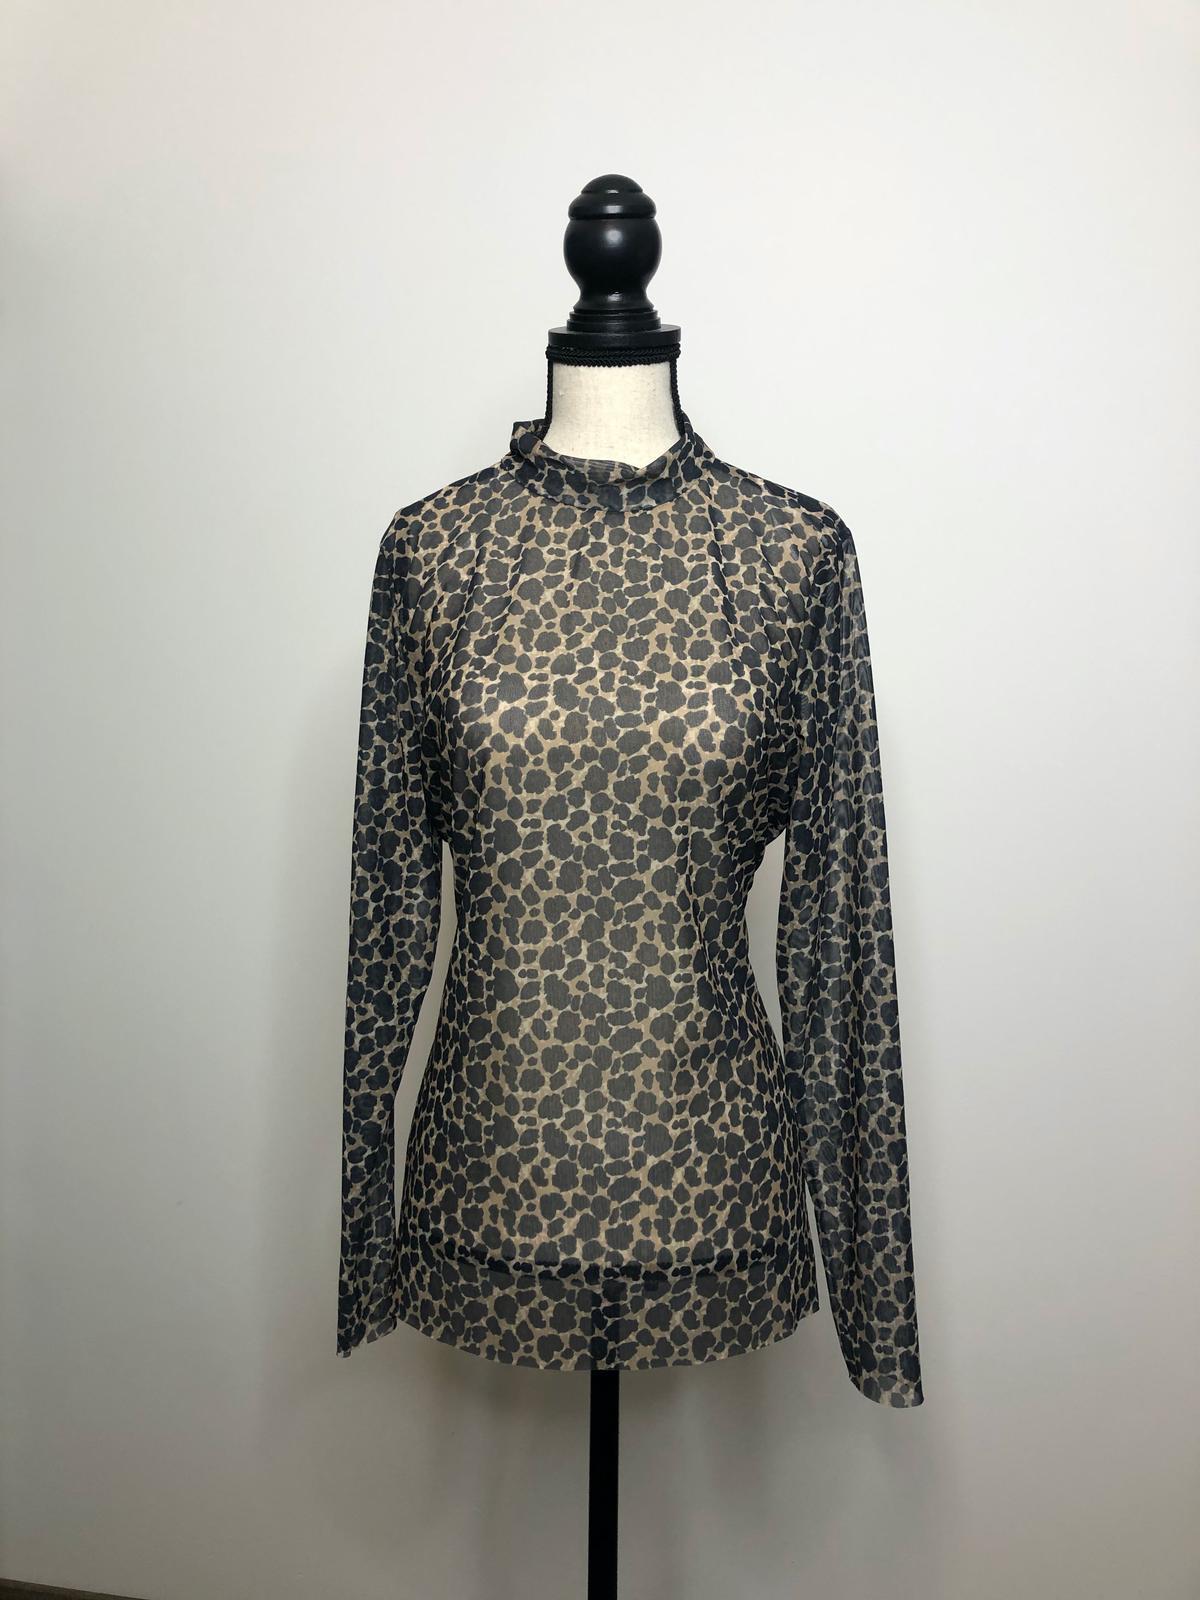 Leopardí top - Obrázok č. 1